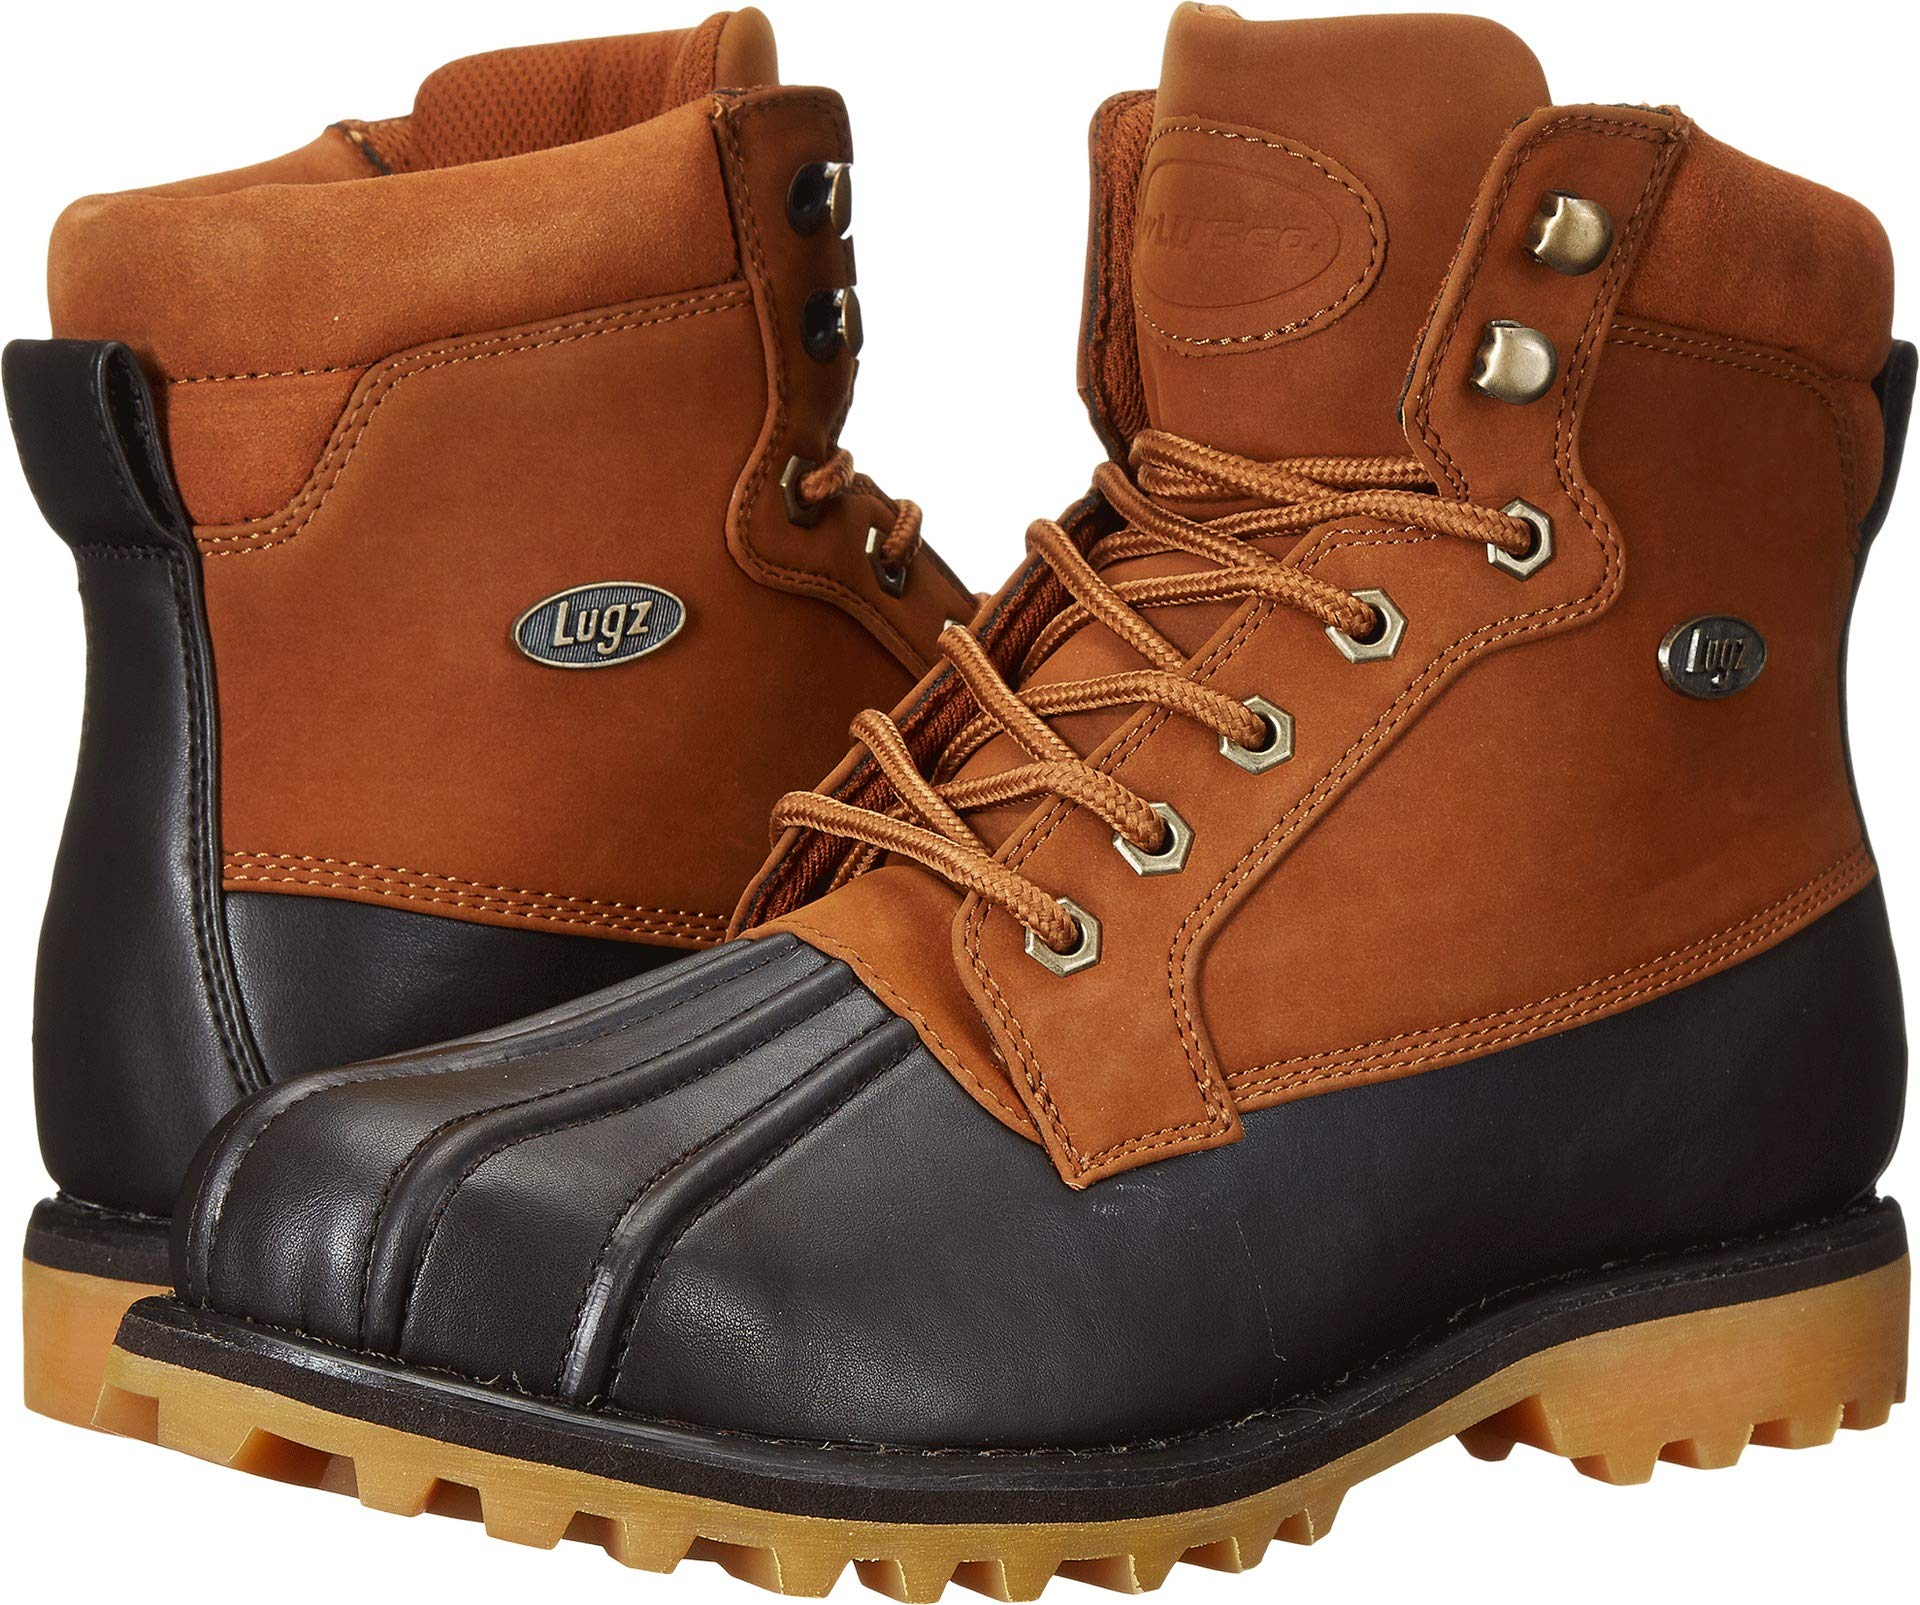 Lugz Men's Mallard Winter Boot, Rust/Dark Brown/Gum, 13 D US